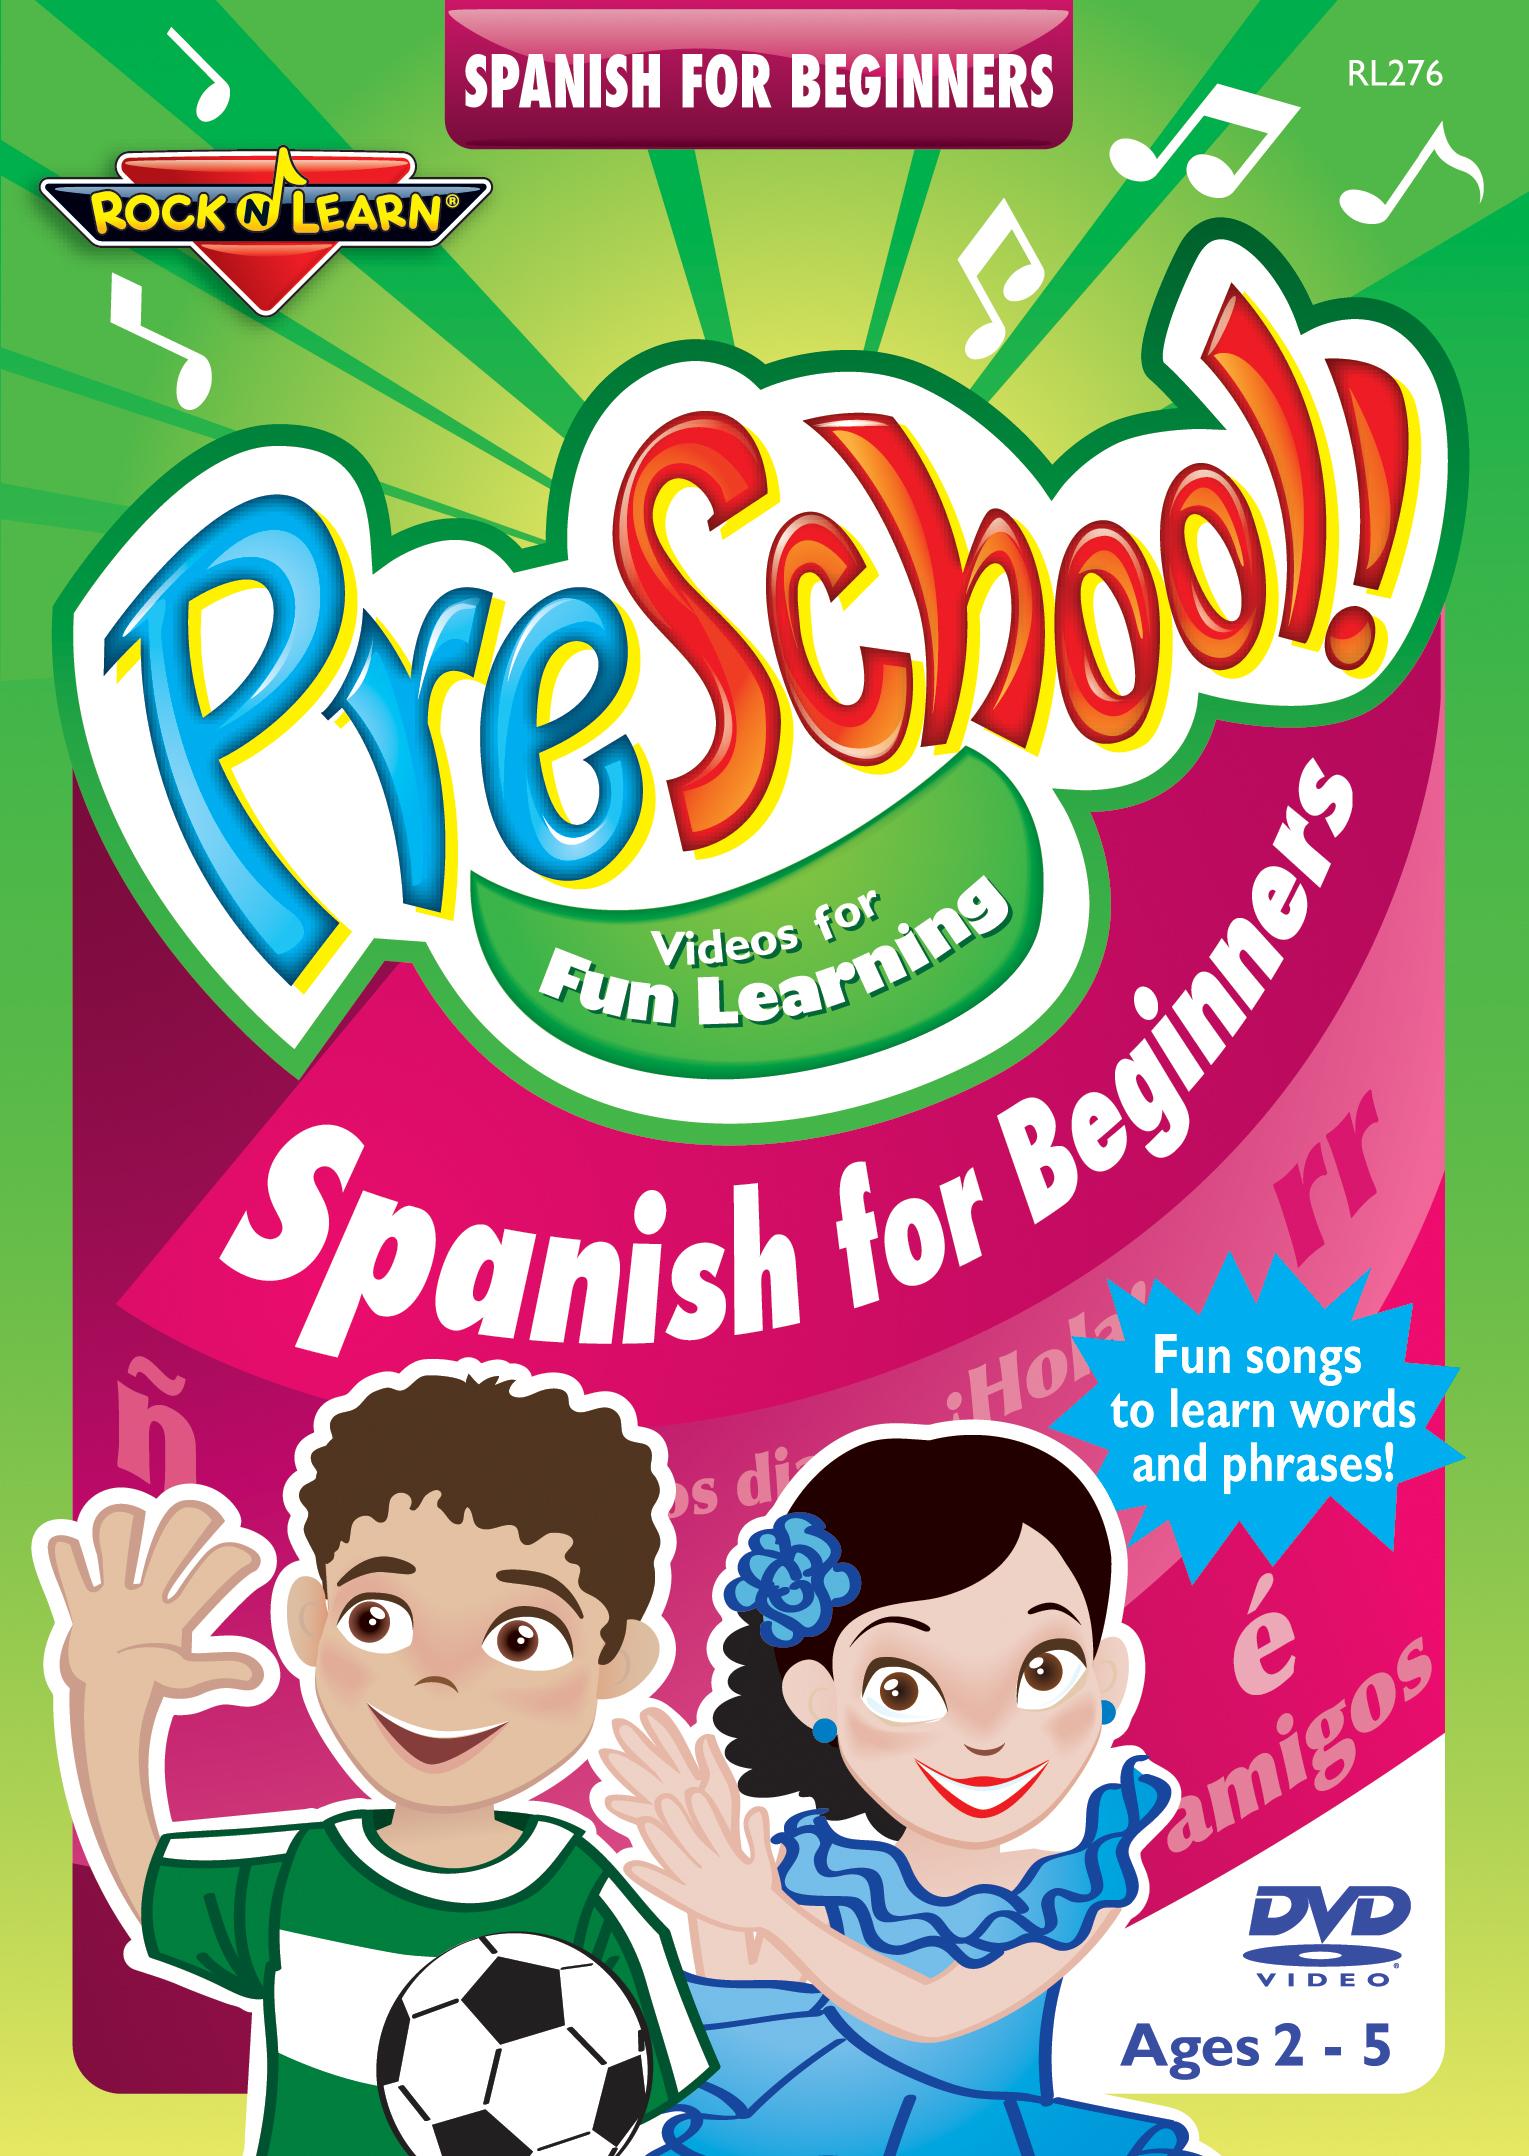 Rock 'N Learn: PreSchool! - Spanish for Beginners